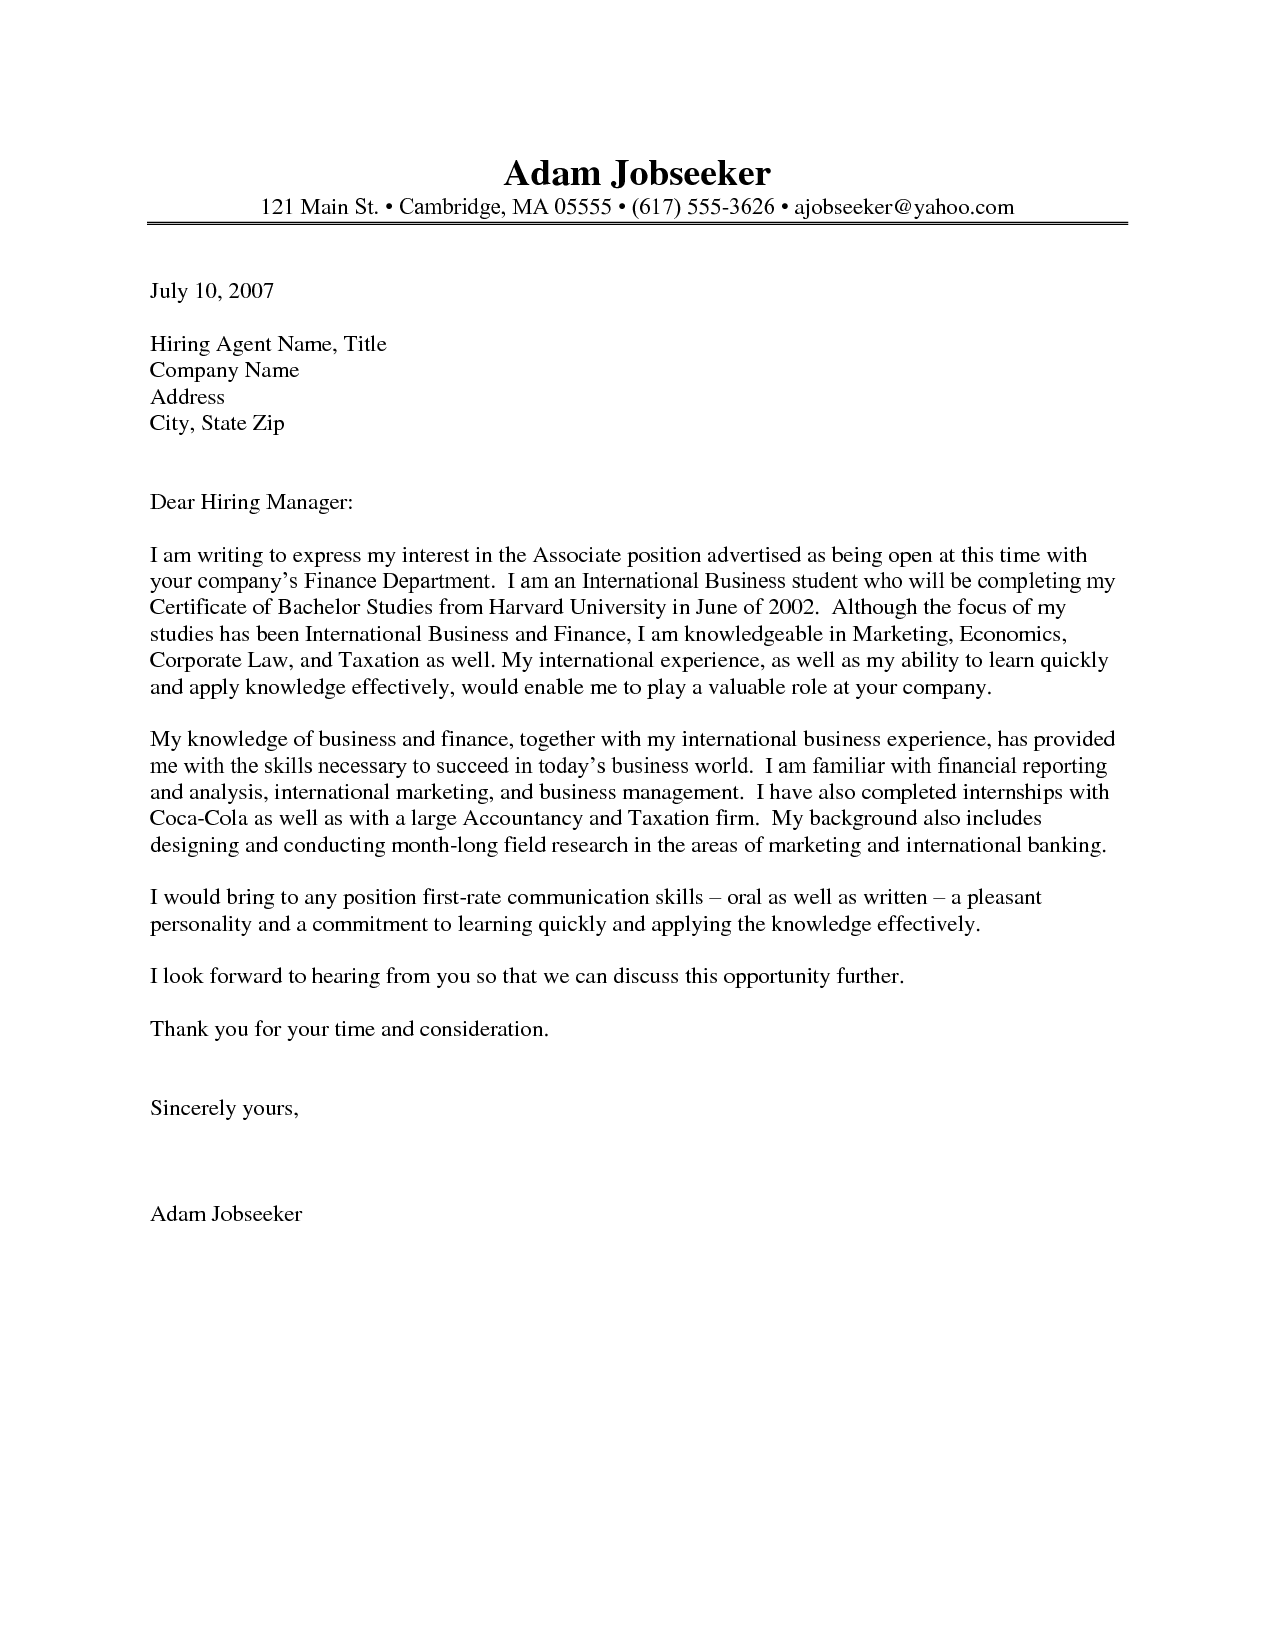 cover letter examples for resume reddity